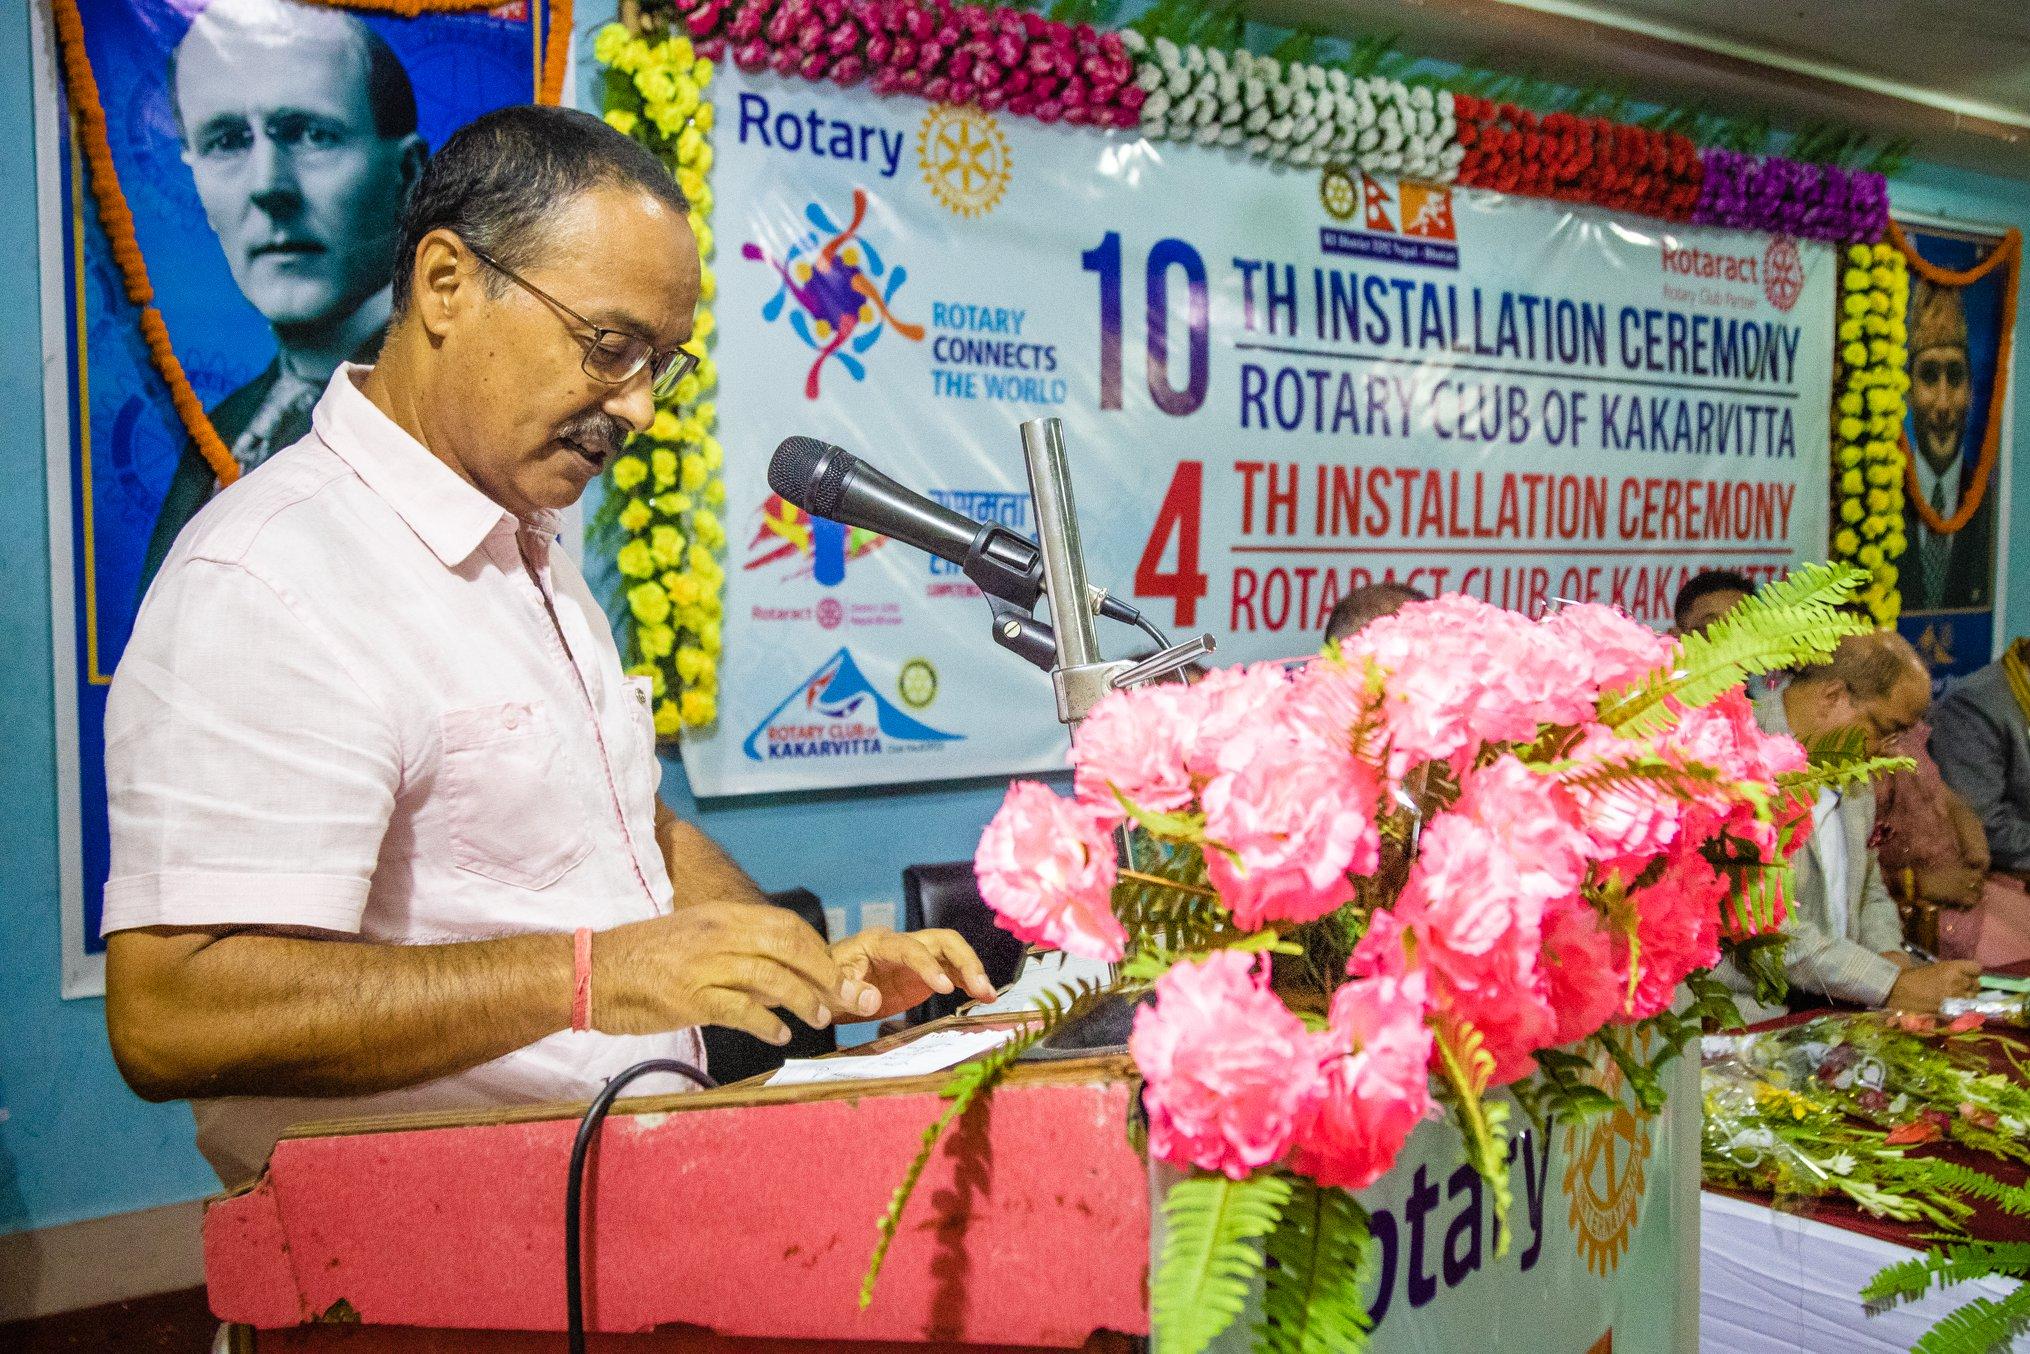 10th Installation Ceremony Rotary Club Of Kakarvitta 43